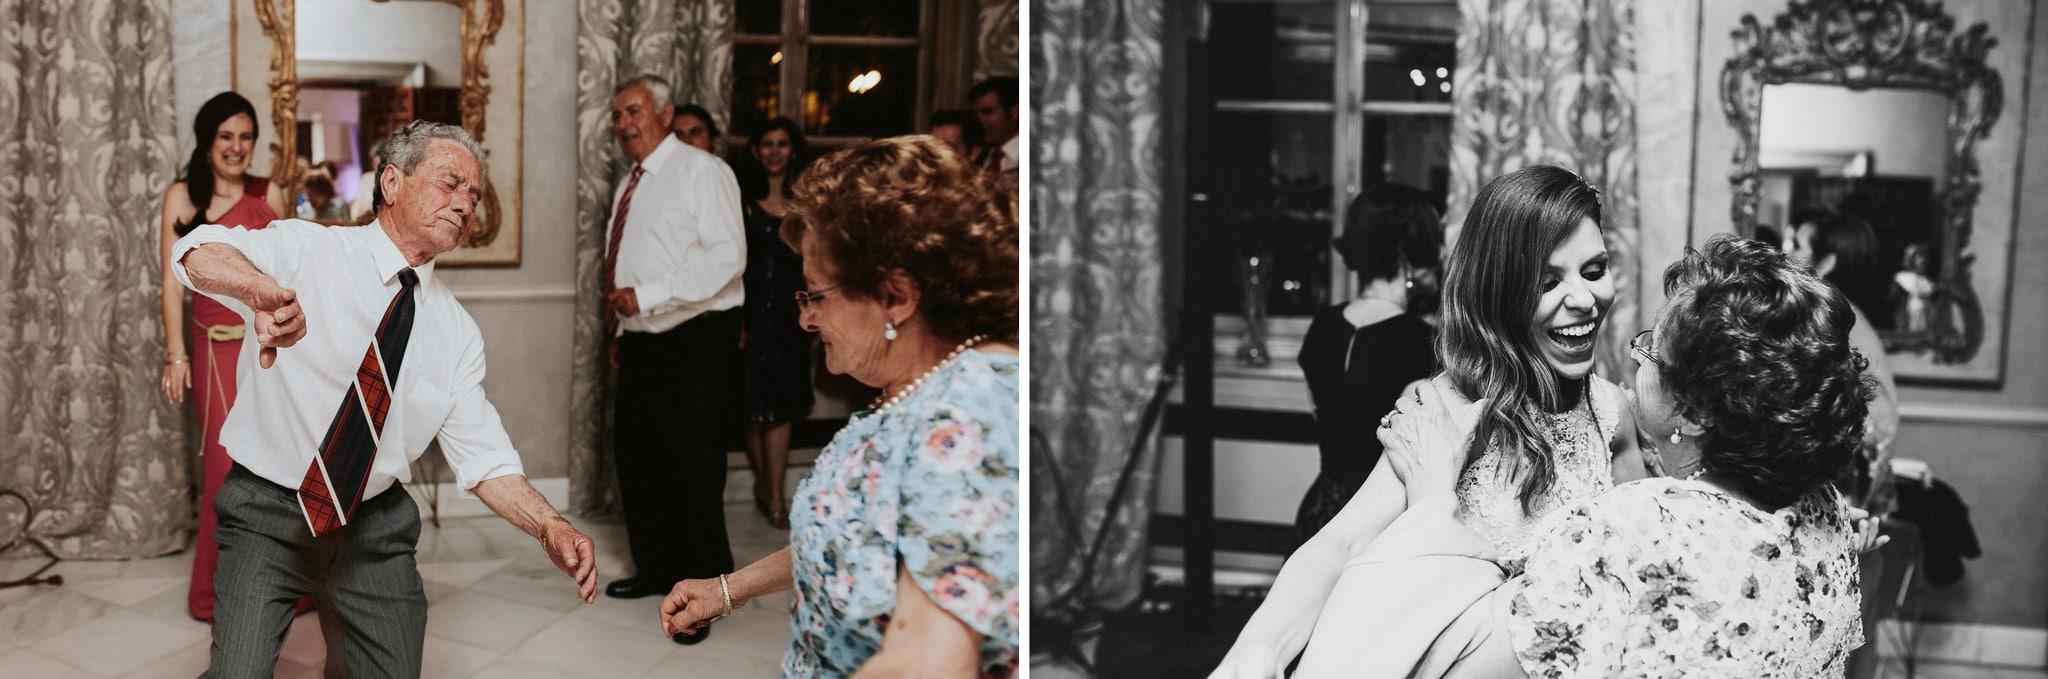 Fotografo-bodas-Cigarral-de-las-Mercedes-135